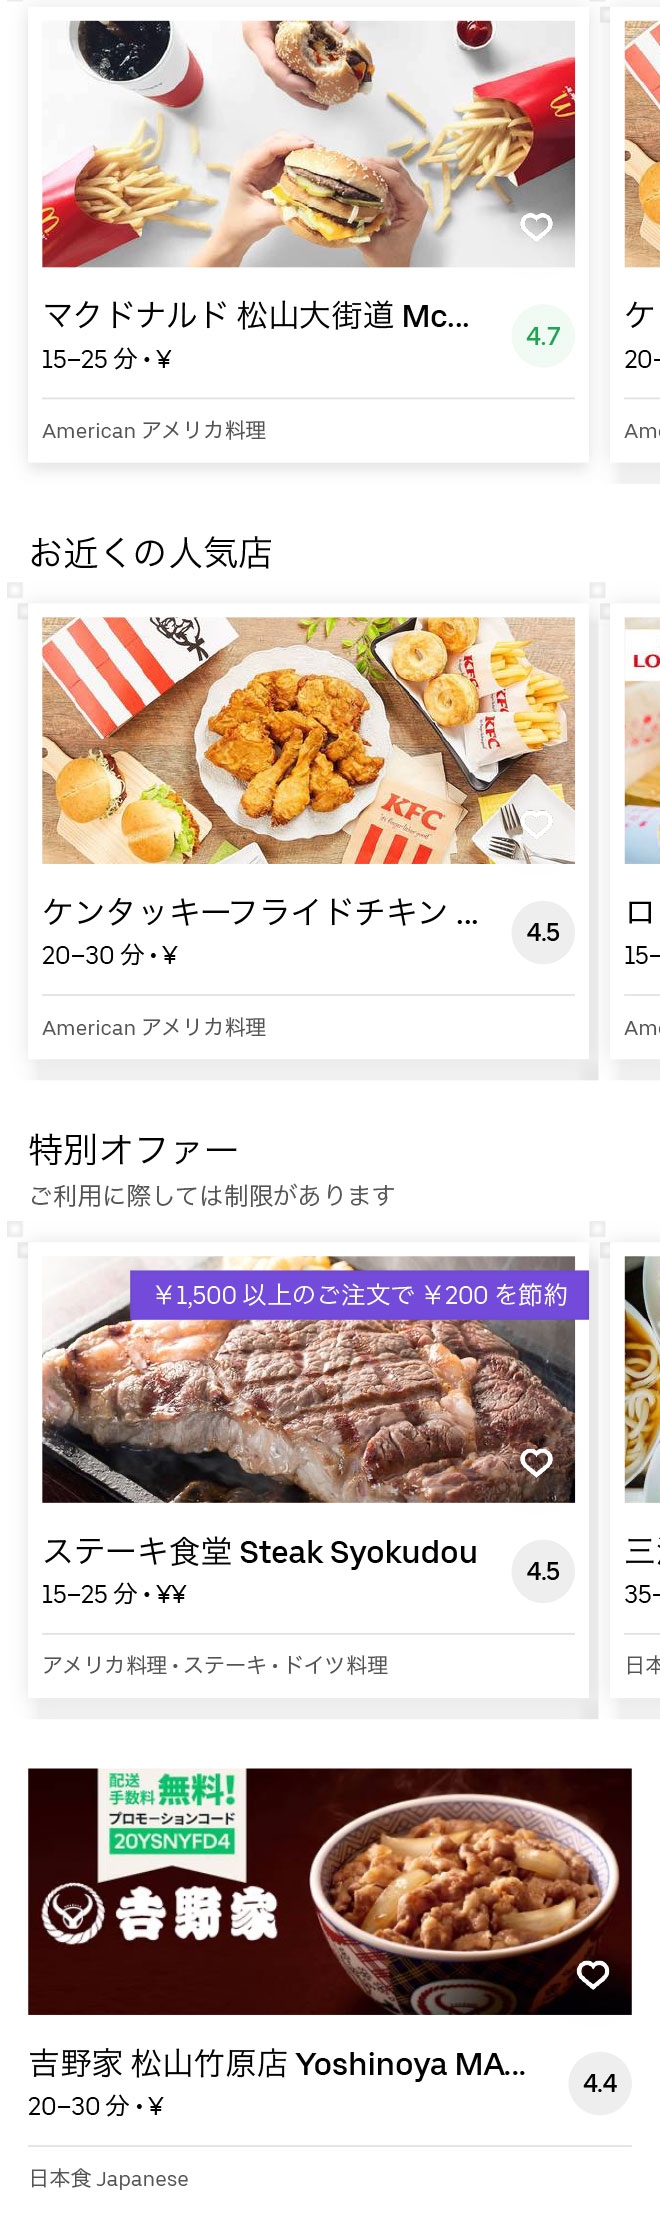 Matsuyama minamimachi menu 200401